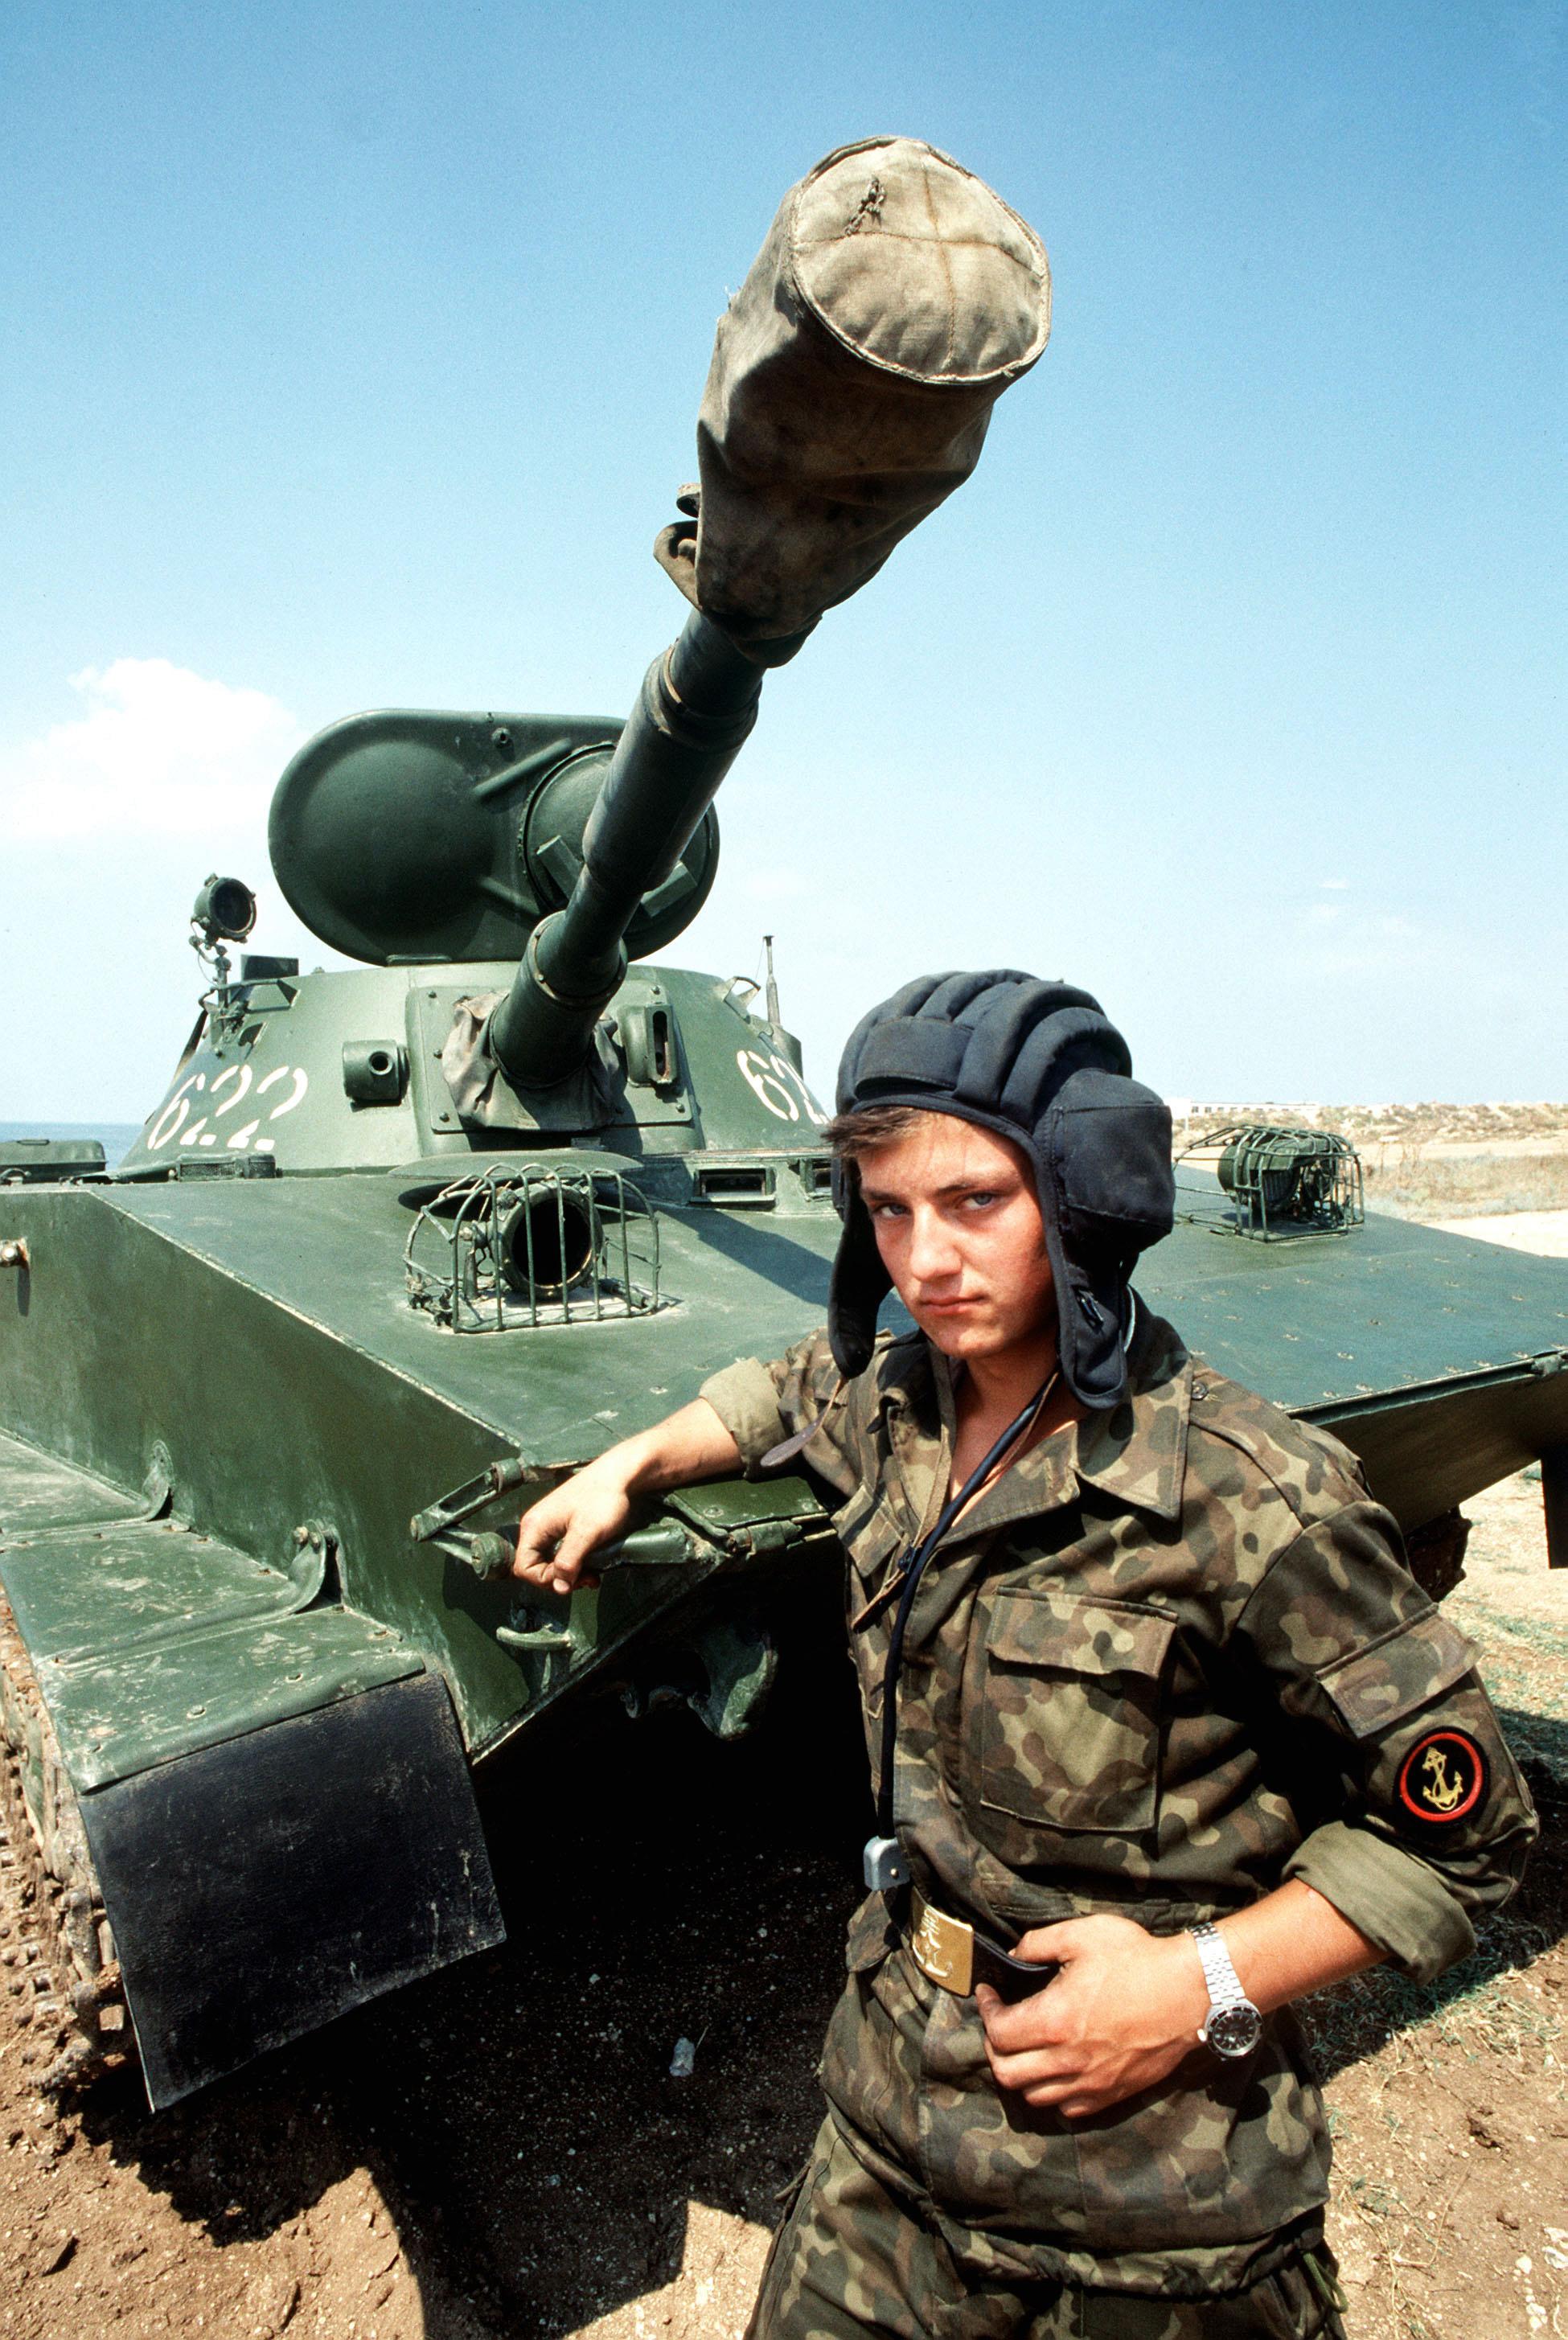 336-я бригада морской пехоты: